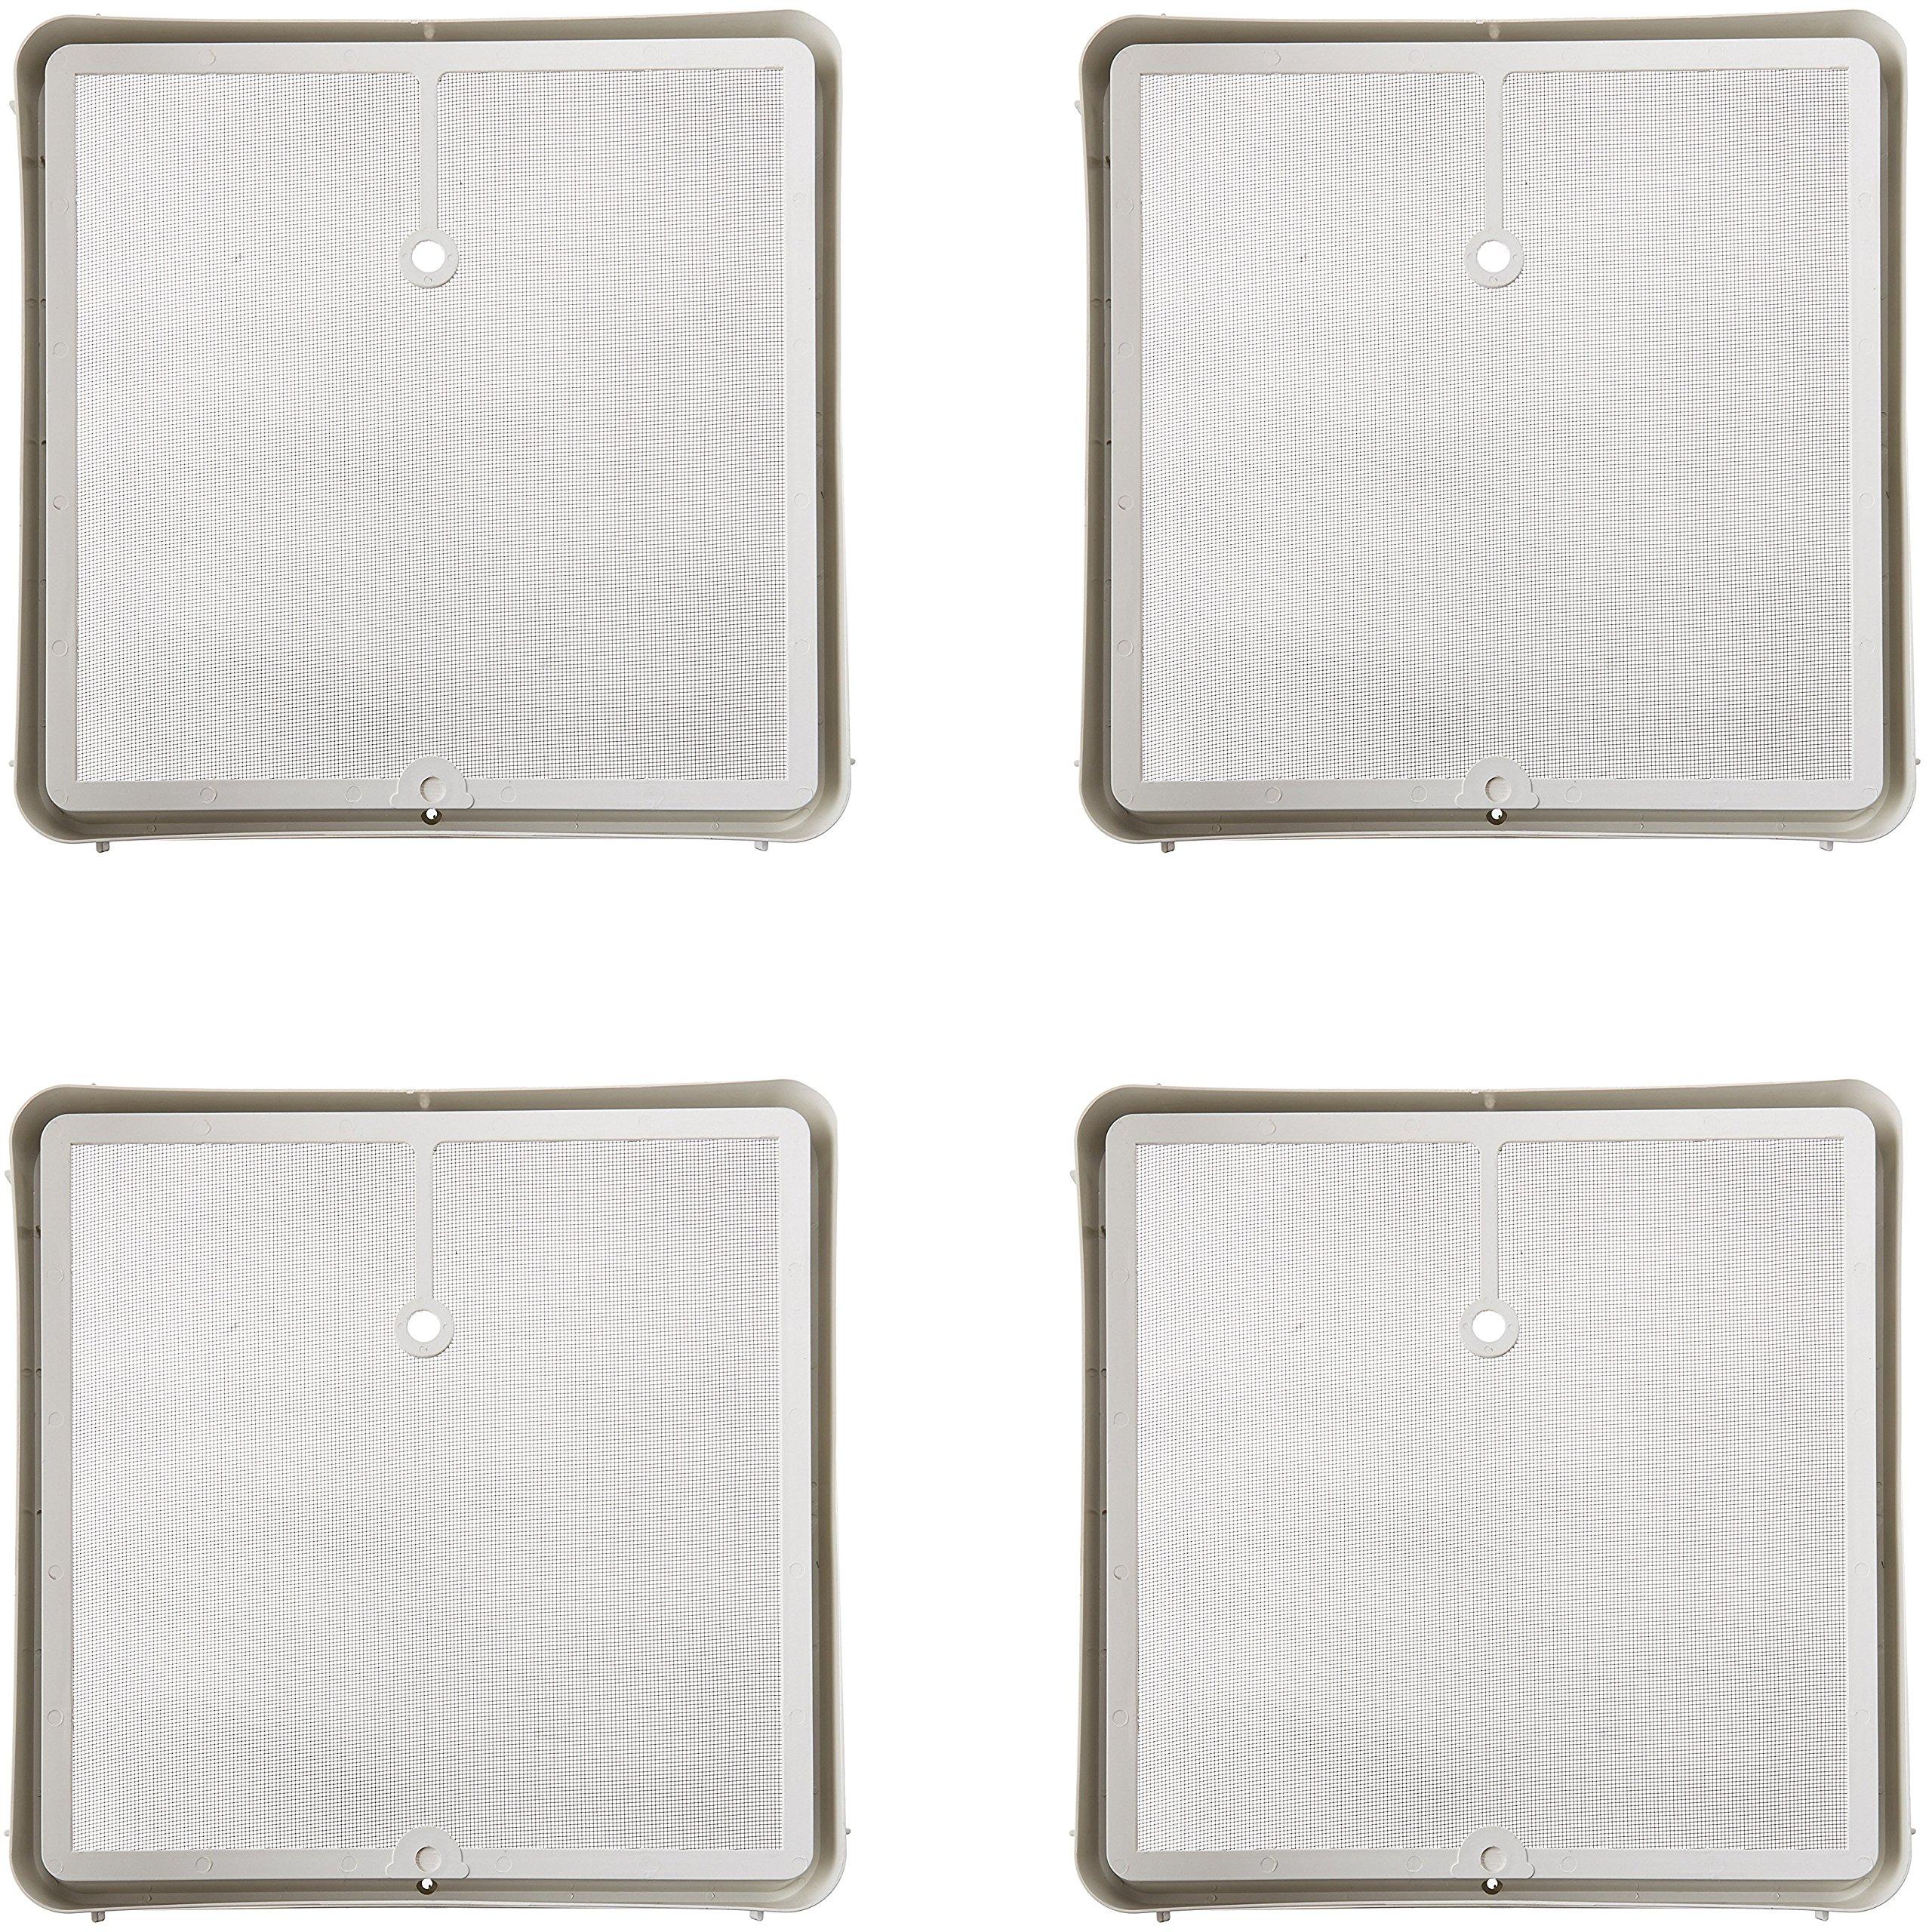 Heng's 90106-C1 Roof Vent Screen Frame, 14'' x 14'' - White (4)